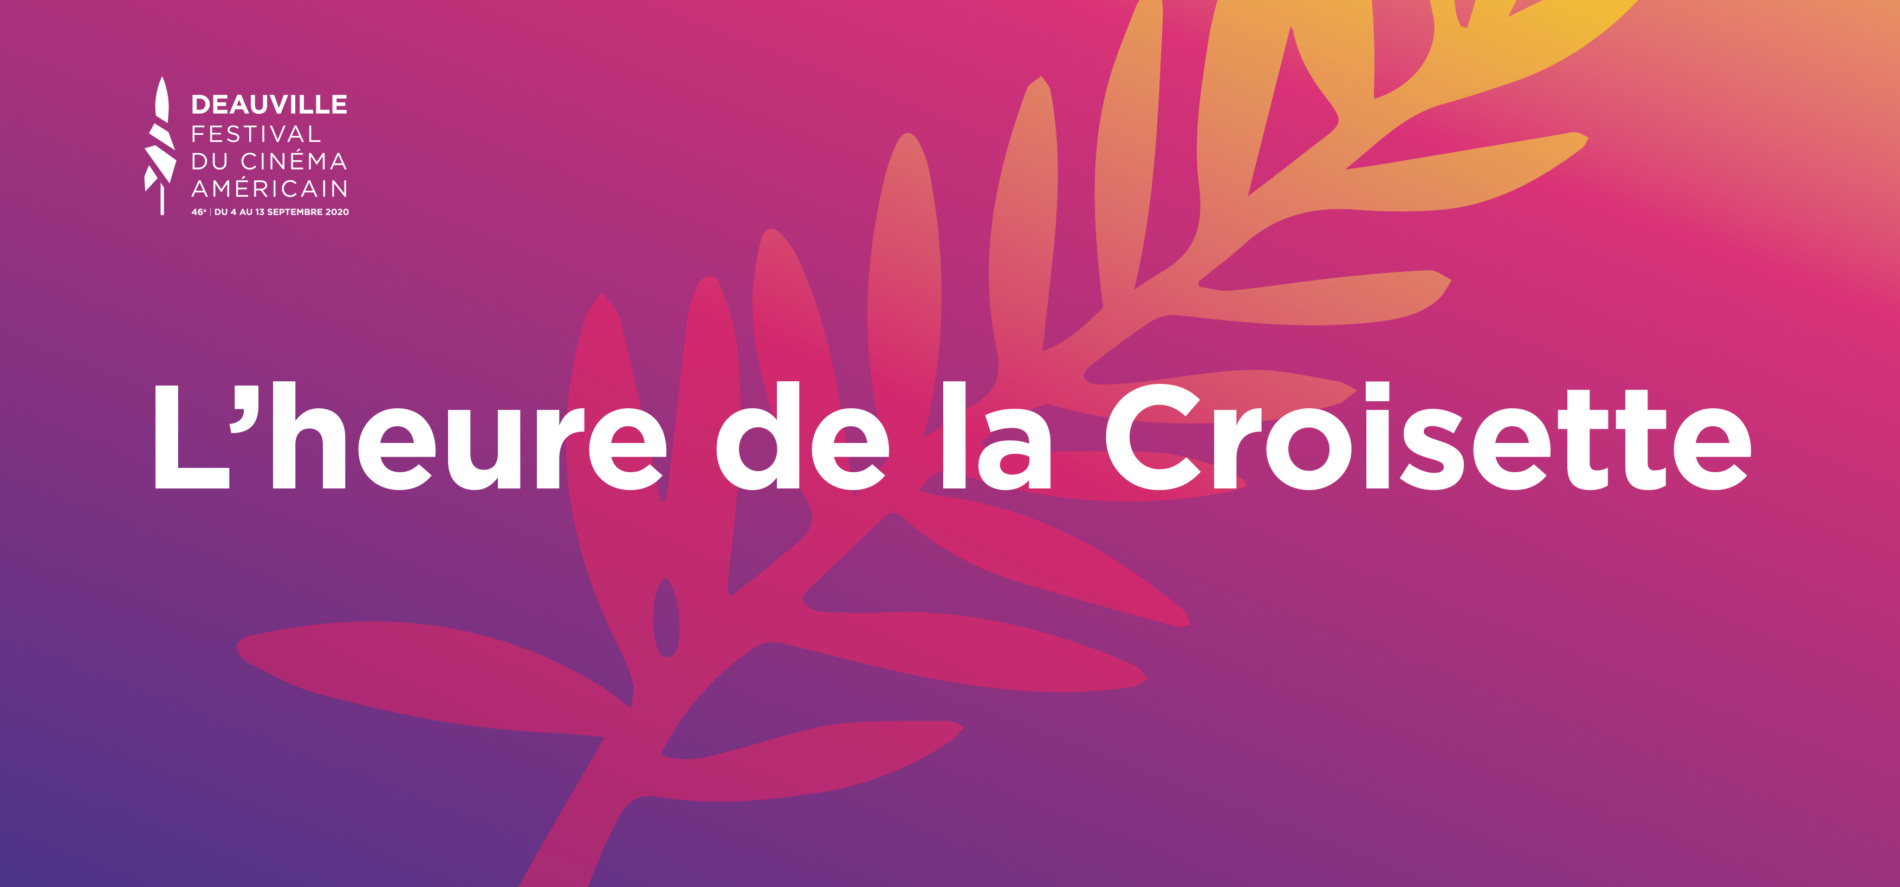 Deauville accueille Cannes